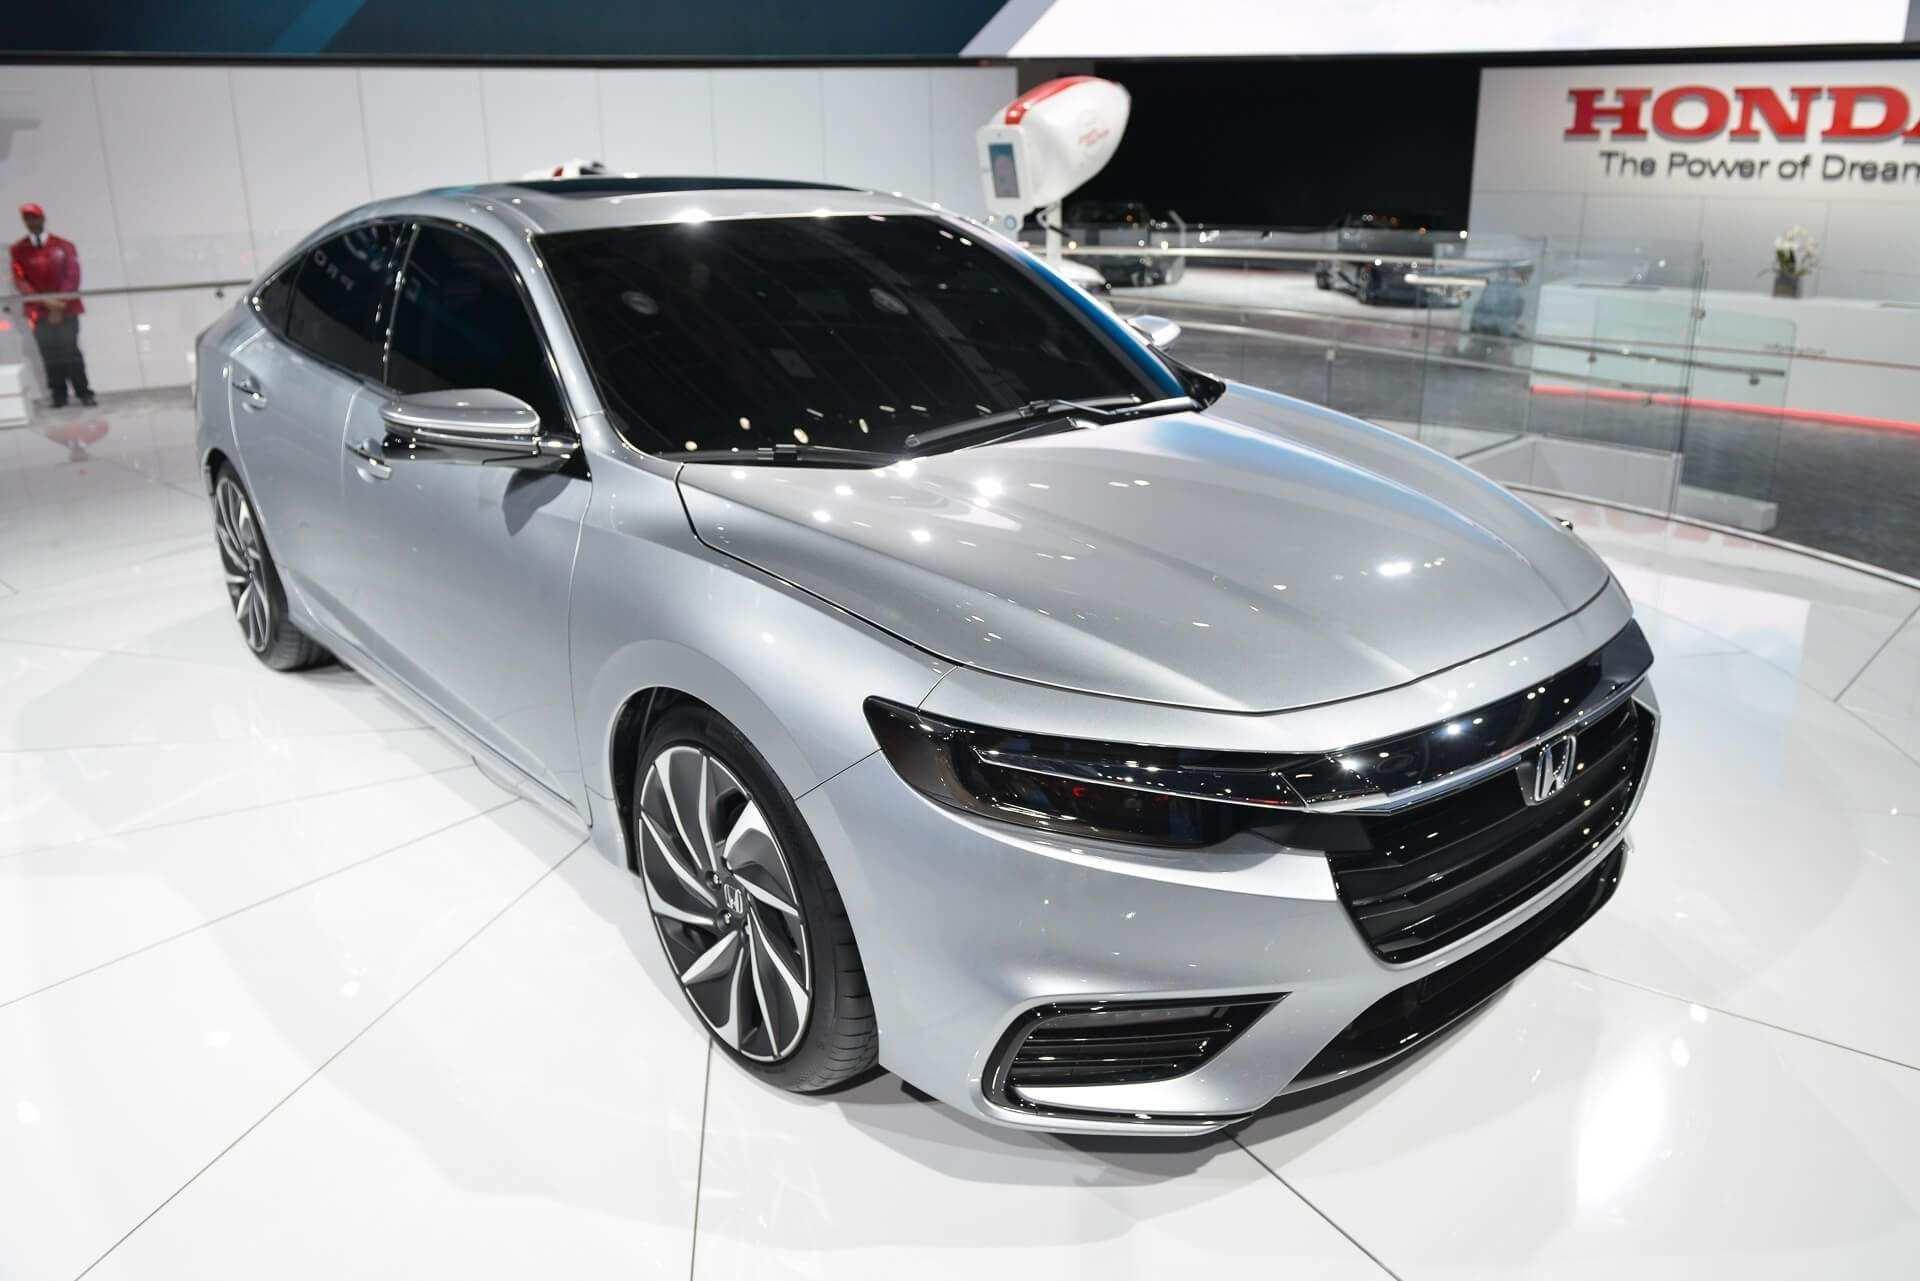 29 Best Review 2020 Honda Civic History for 2020 Honda Civic